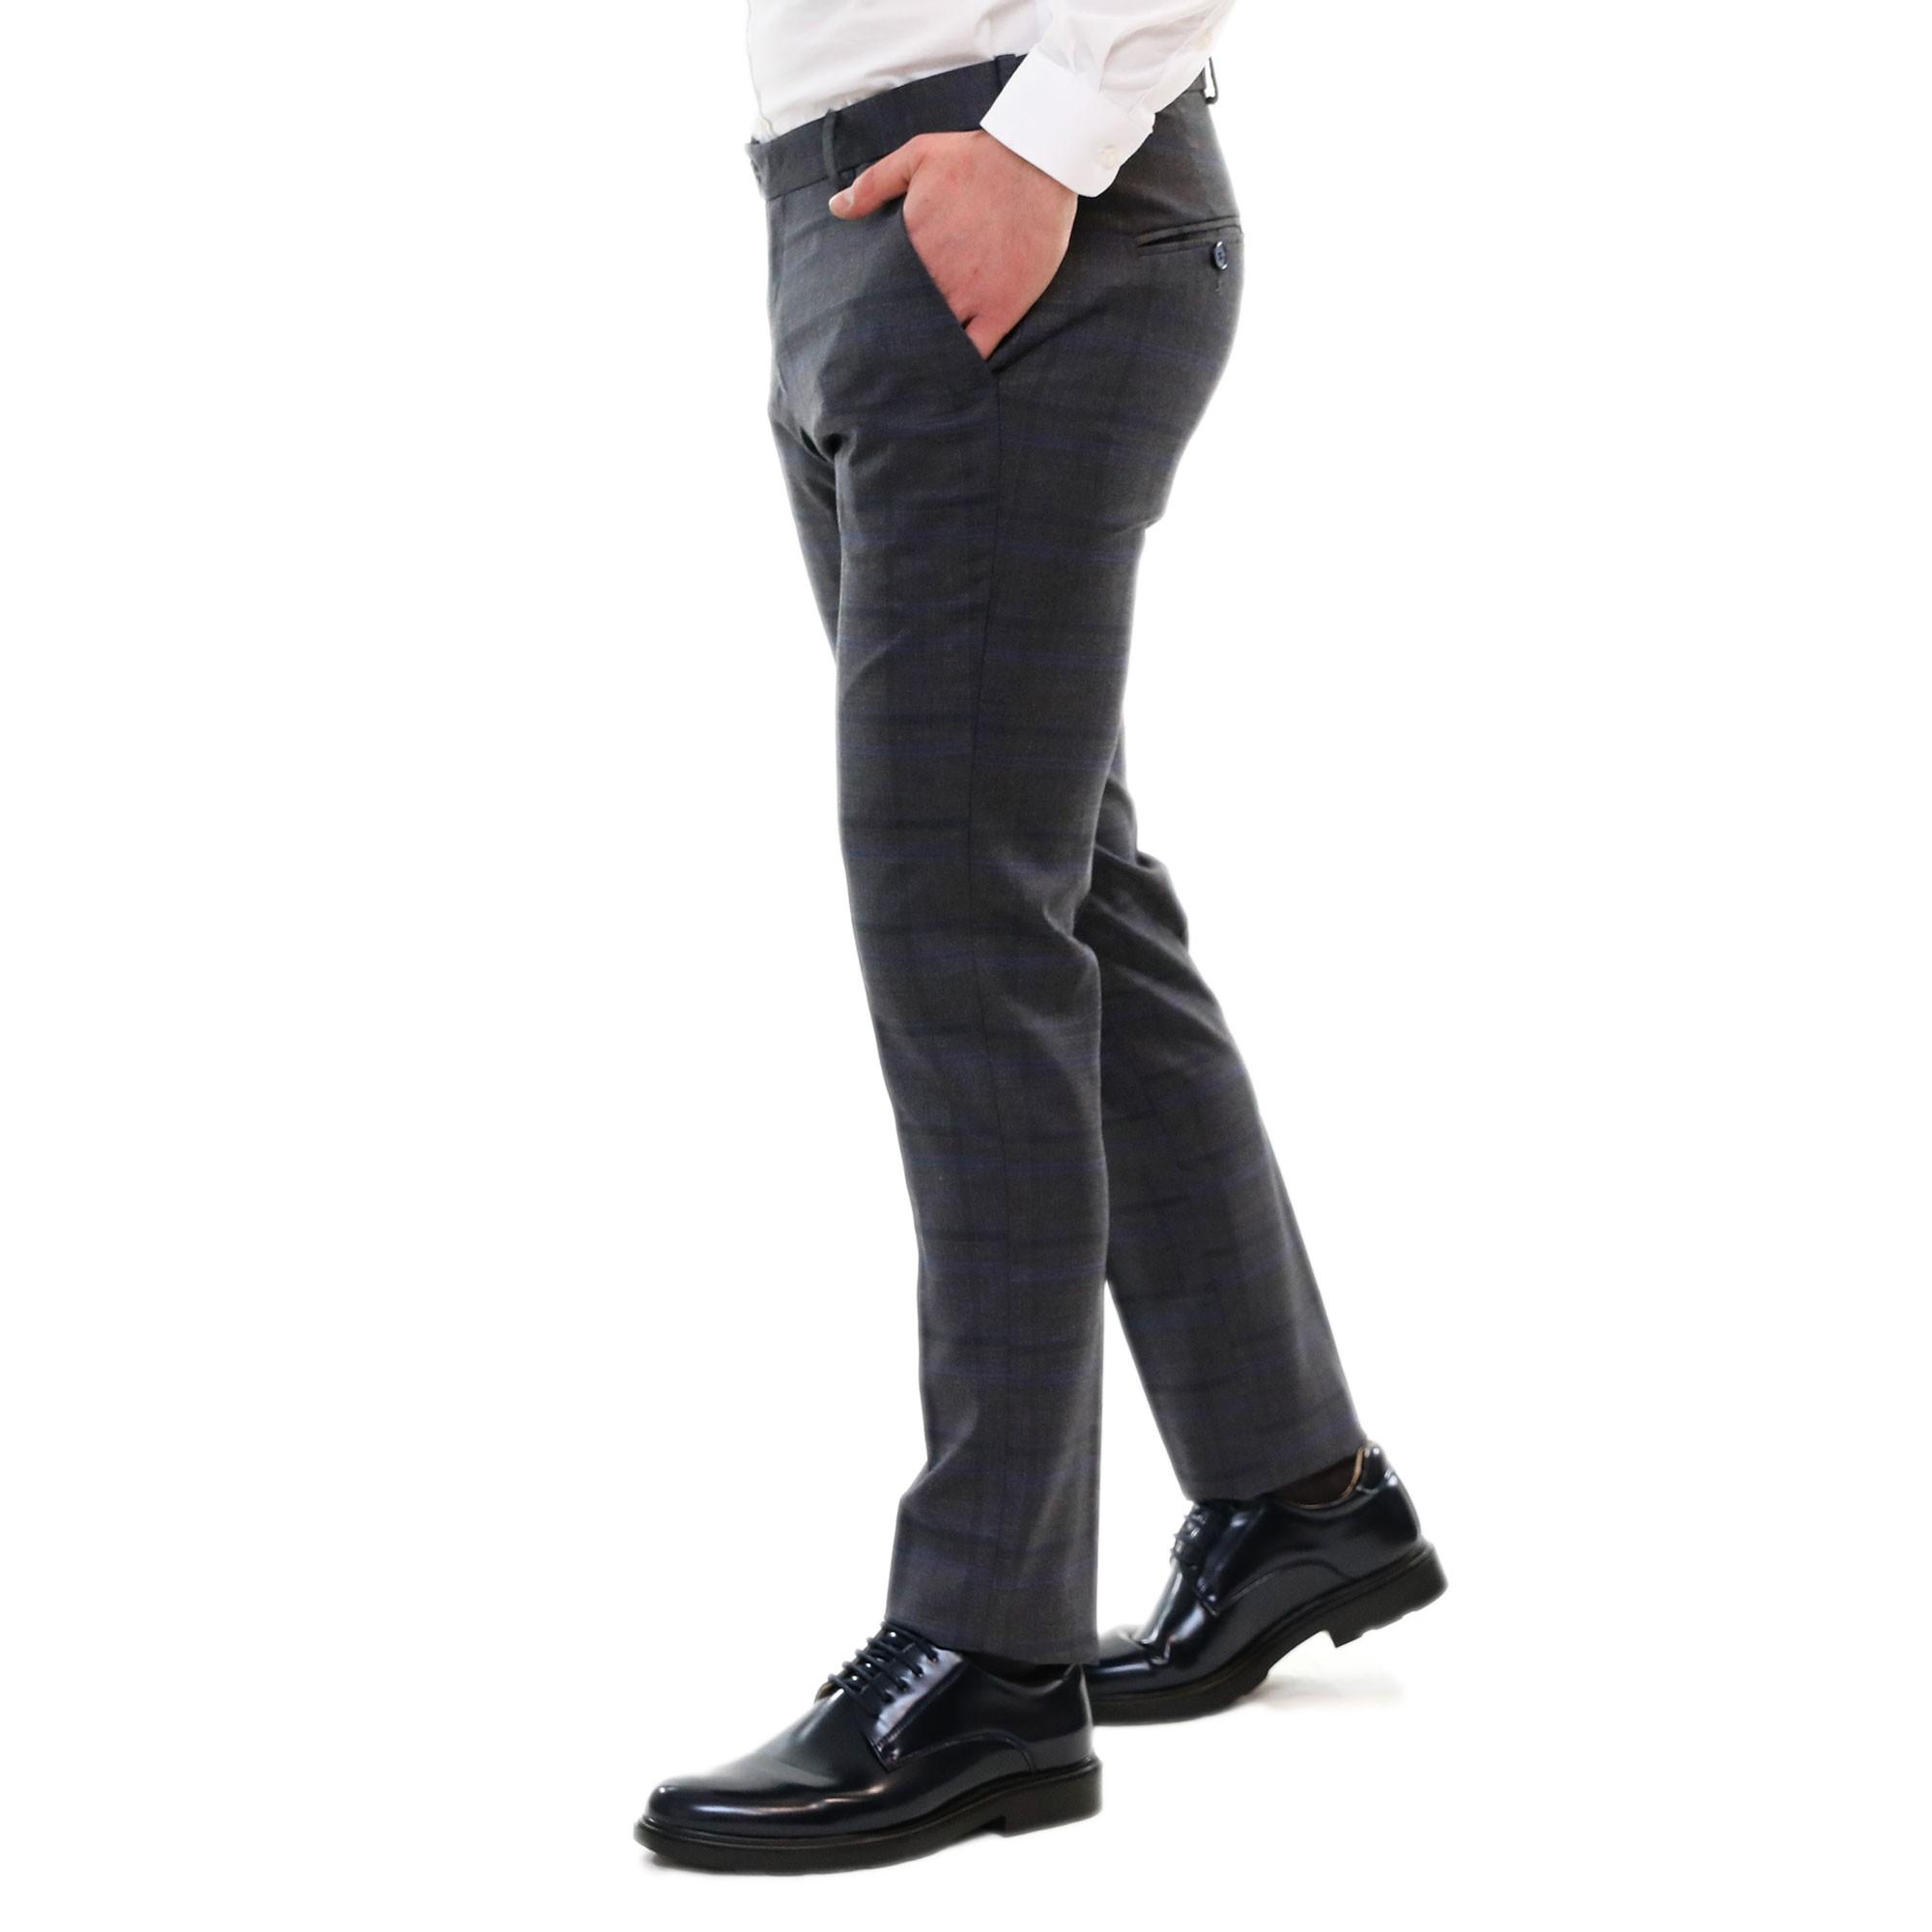 Pantaloni-Uomo-Chino-Cotone-Elegante-Estivi-Abito-Estivo-Tasca-America miniatura 6